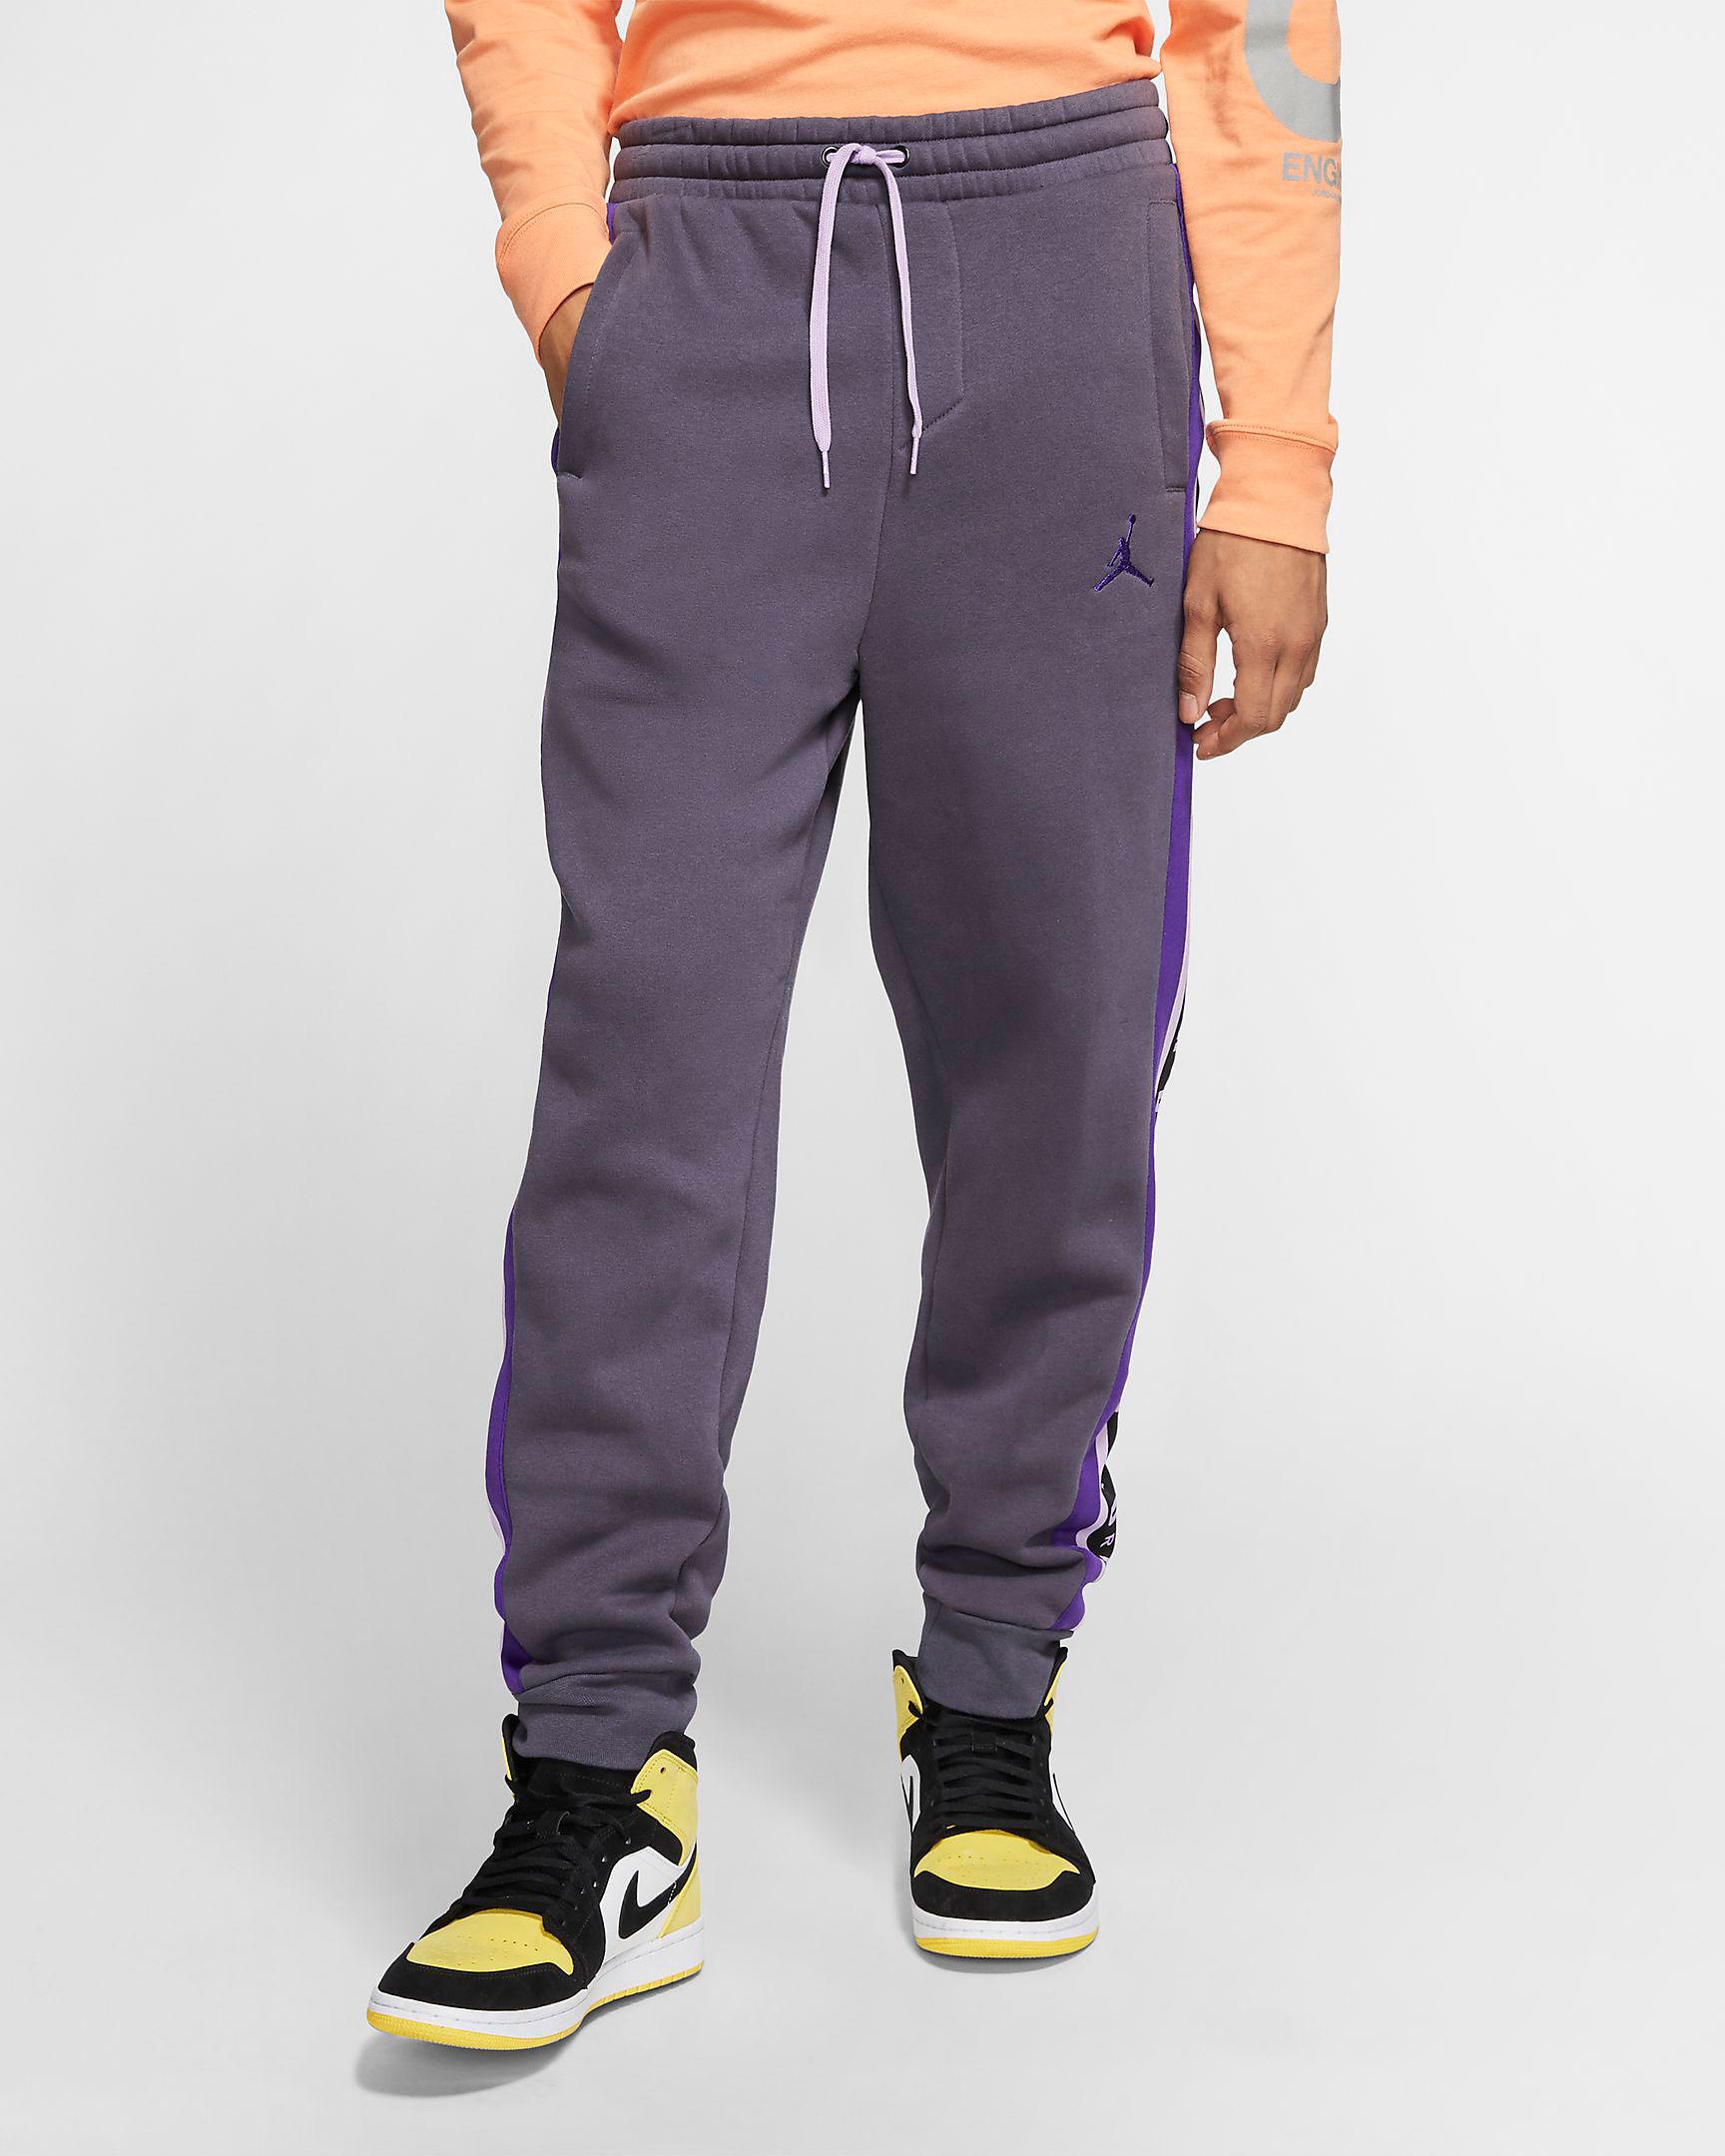 air-jordan-4-metallic-purple-pants-match-1